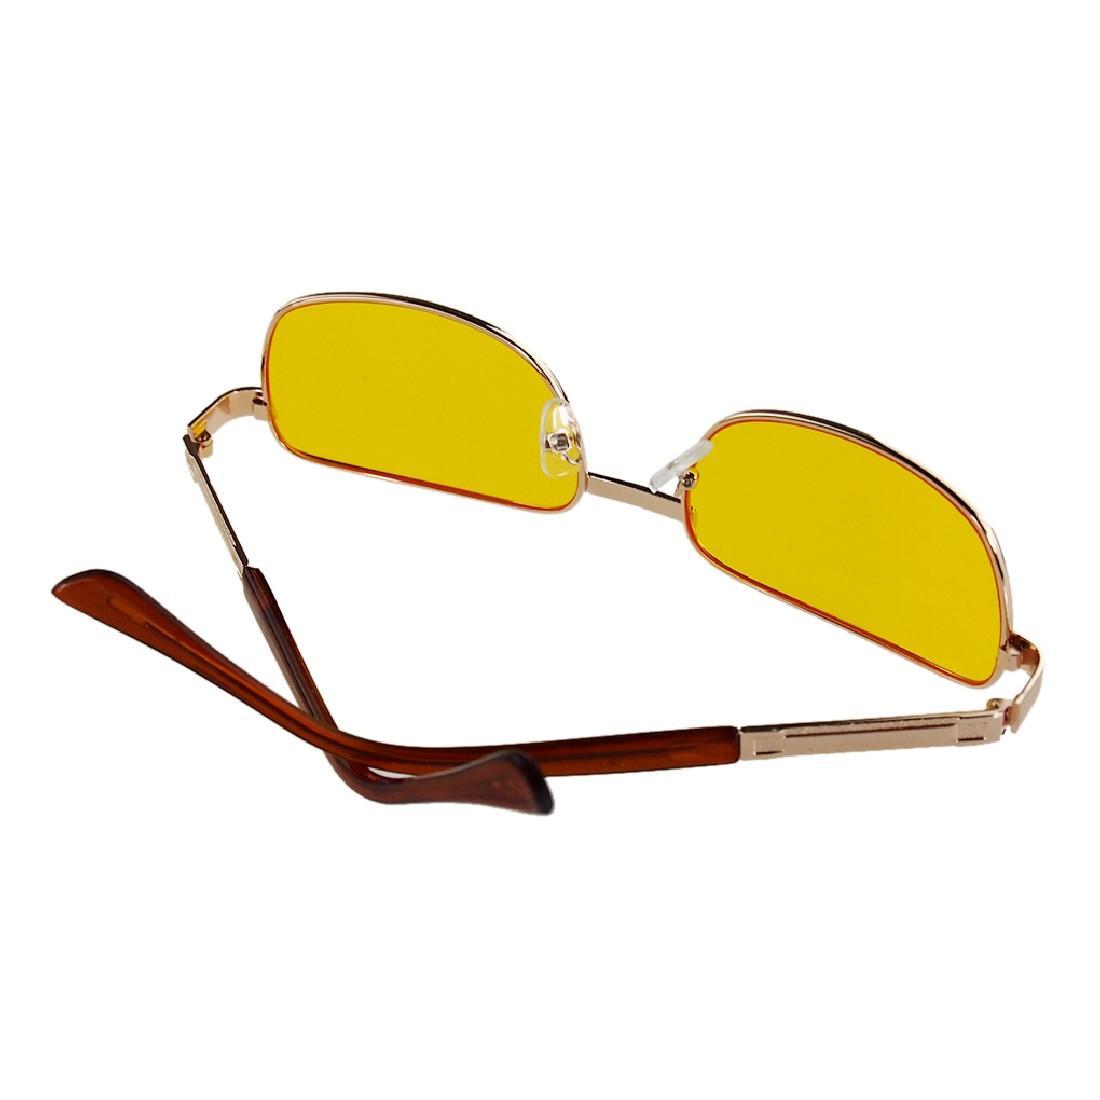 ... Fashion Sempit Bingkai Modus Malam Mengemudi Emas Bingkai Kacamata ( Kuning) - 4 ...